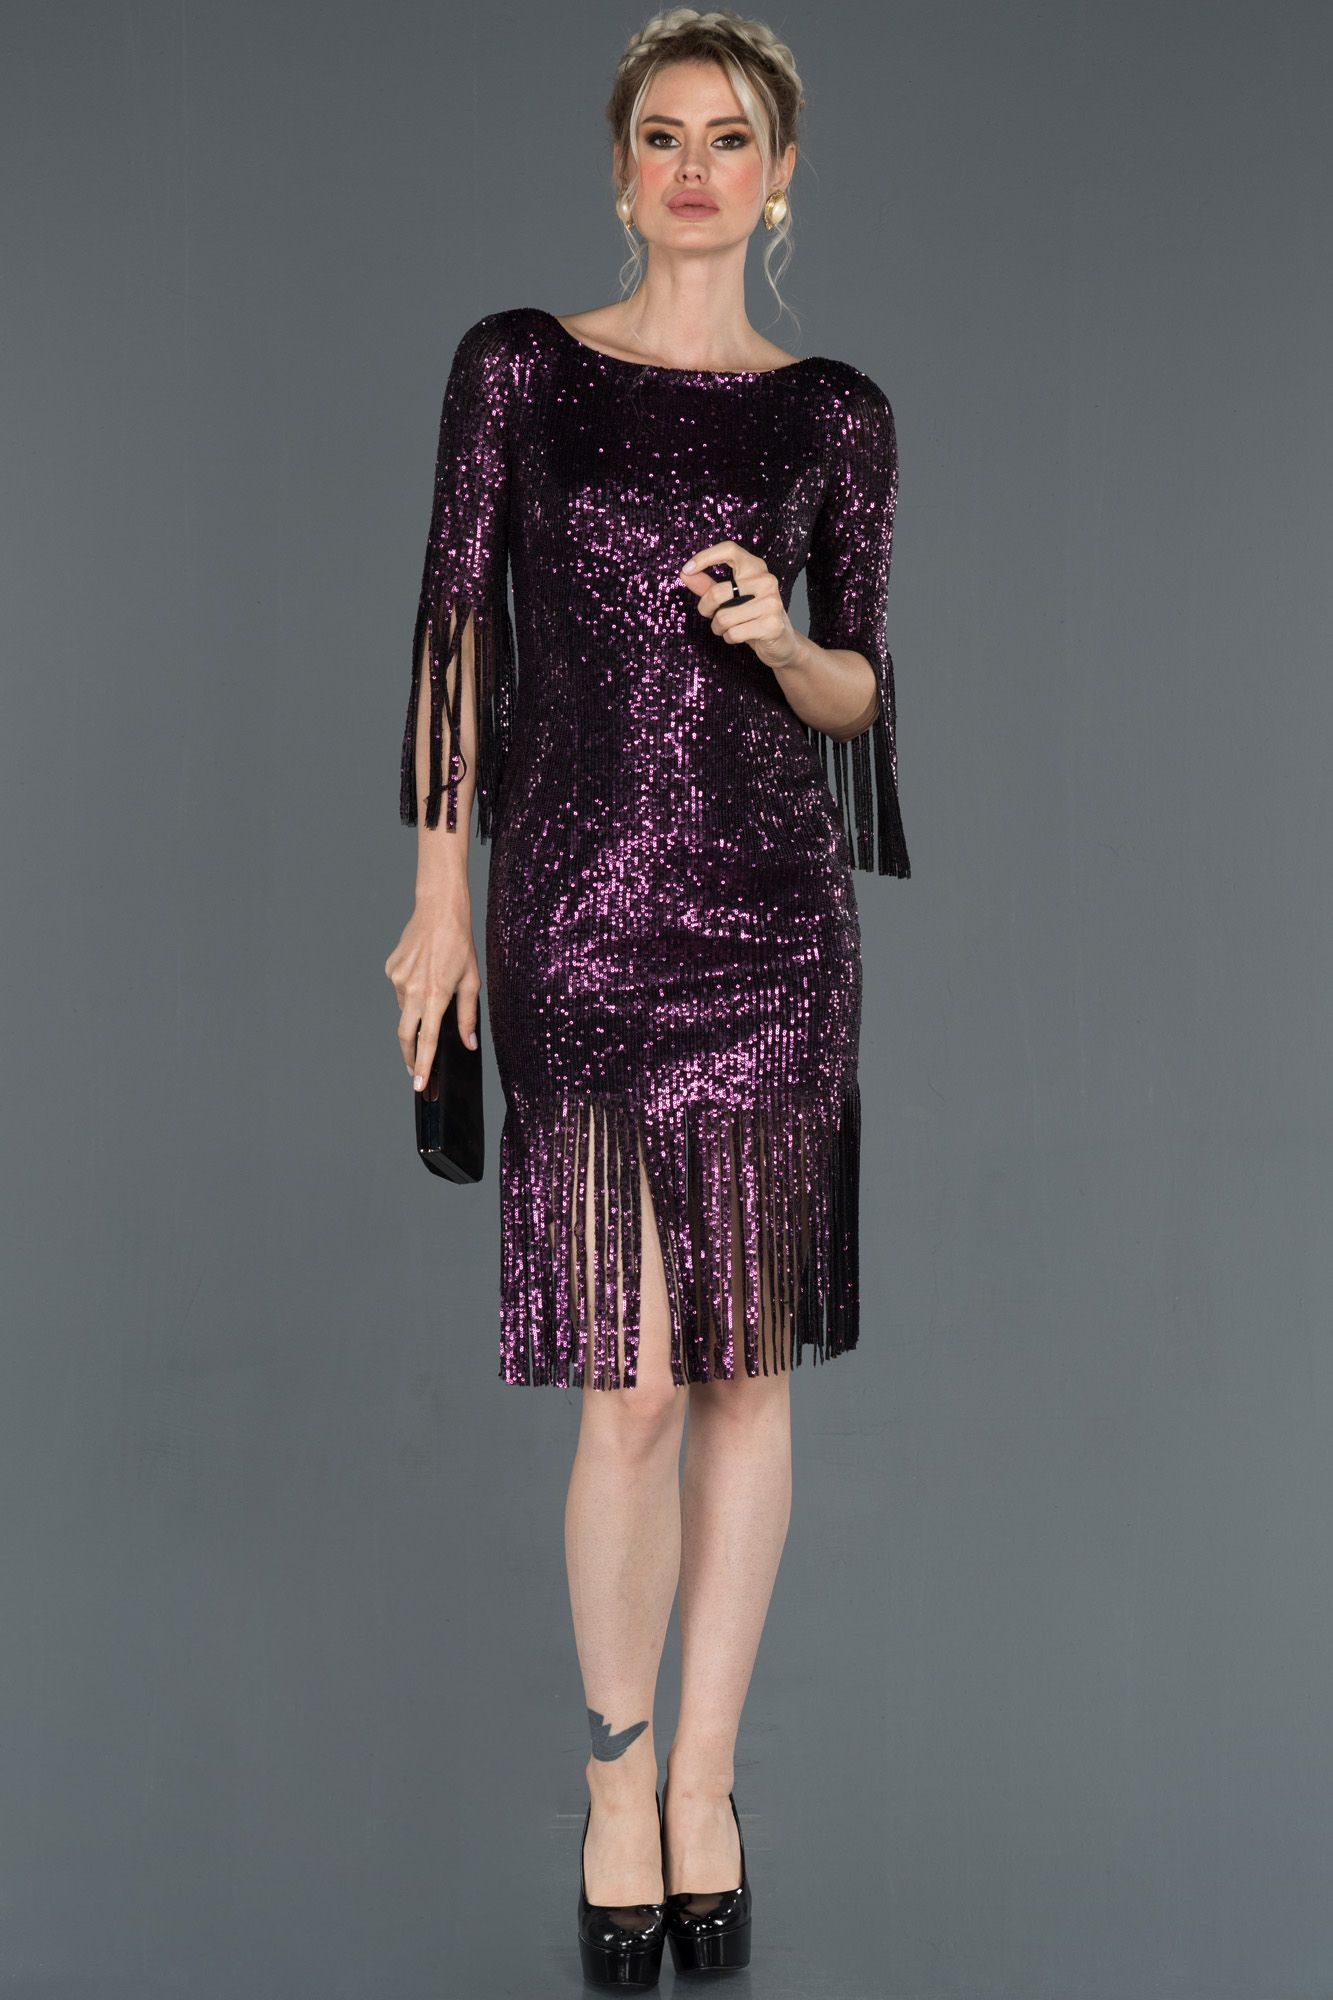 Murdum Kisa Puskullu Pul Payetli Davet Elbisesi Abk670 2020 Moda Stilleri Elbise Elbise Modelleri